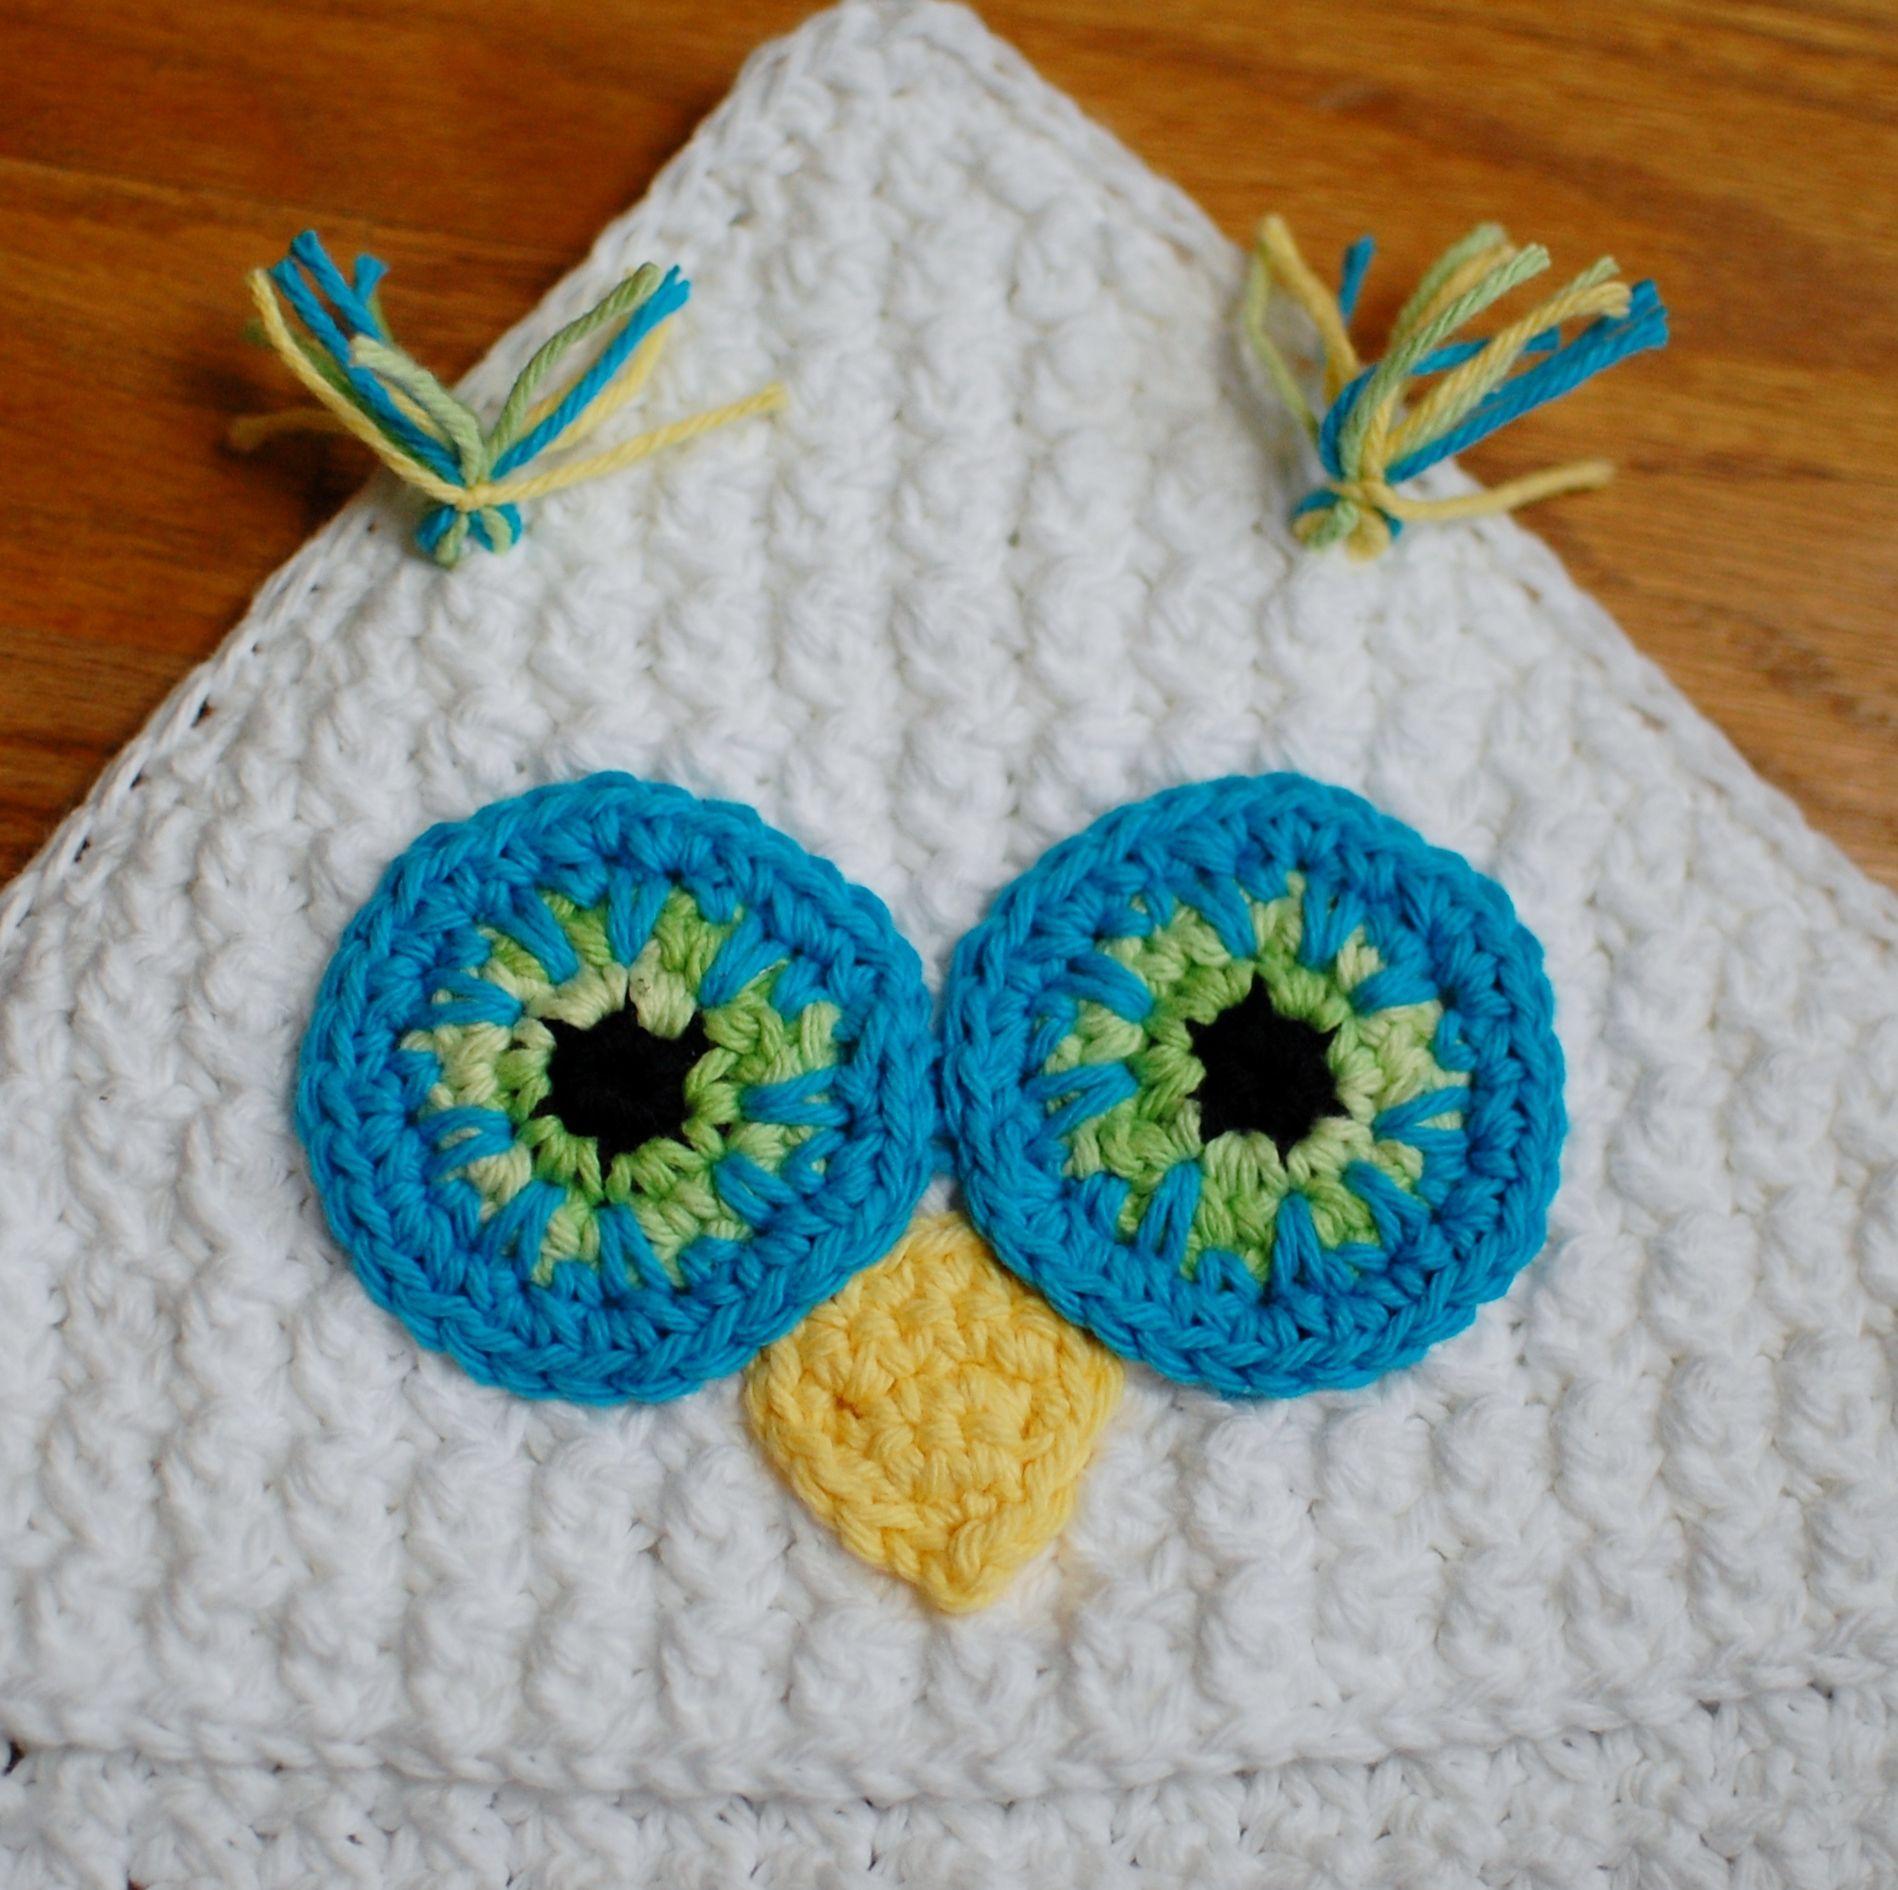 Freecrochetowlblanketpatterns crochet pattern owl hooded freecrochetowlblanketpatterns crochet pattern owl hooded baby bankloansurffo Image collections